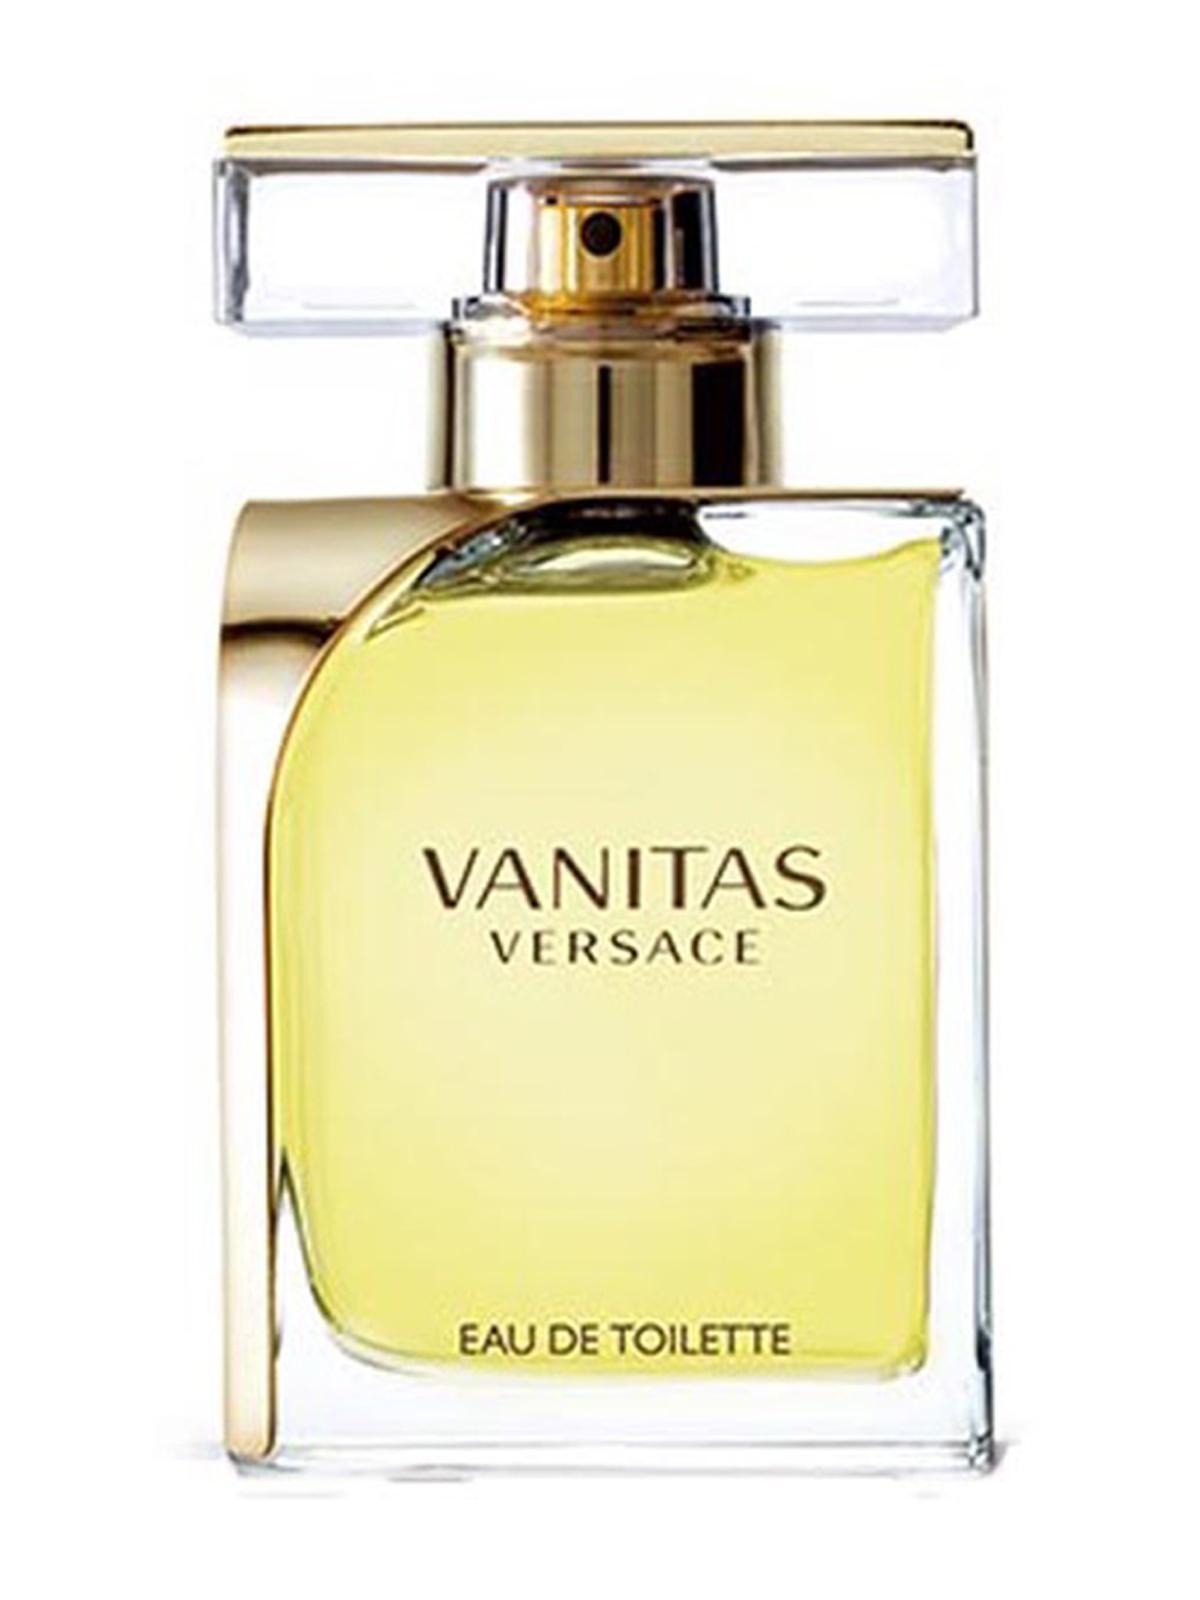 Versace Vanitas for Women Eau de Toilette